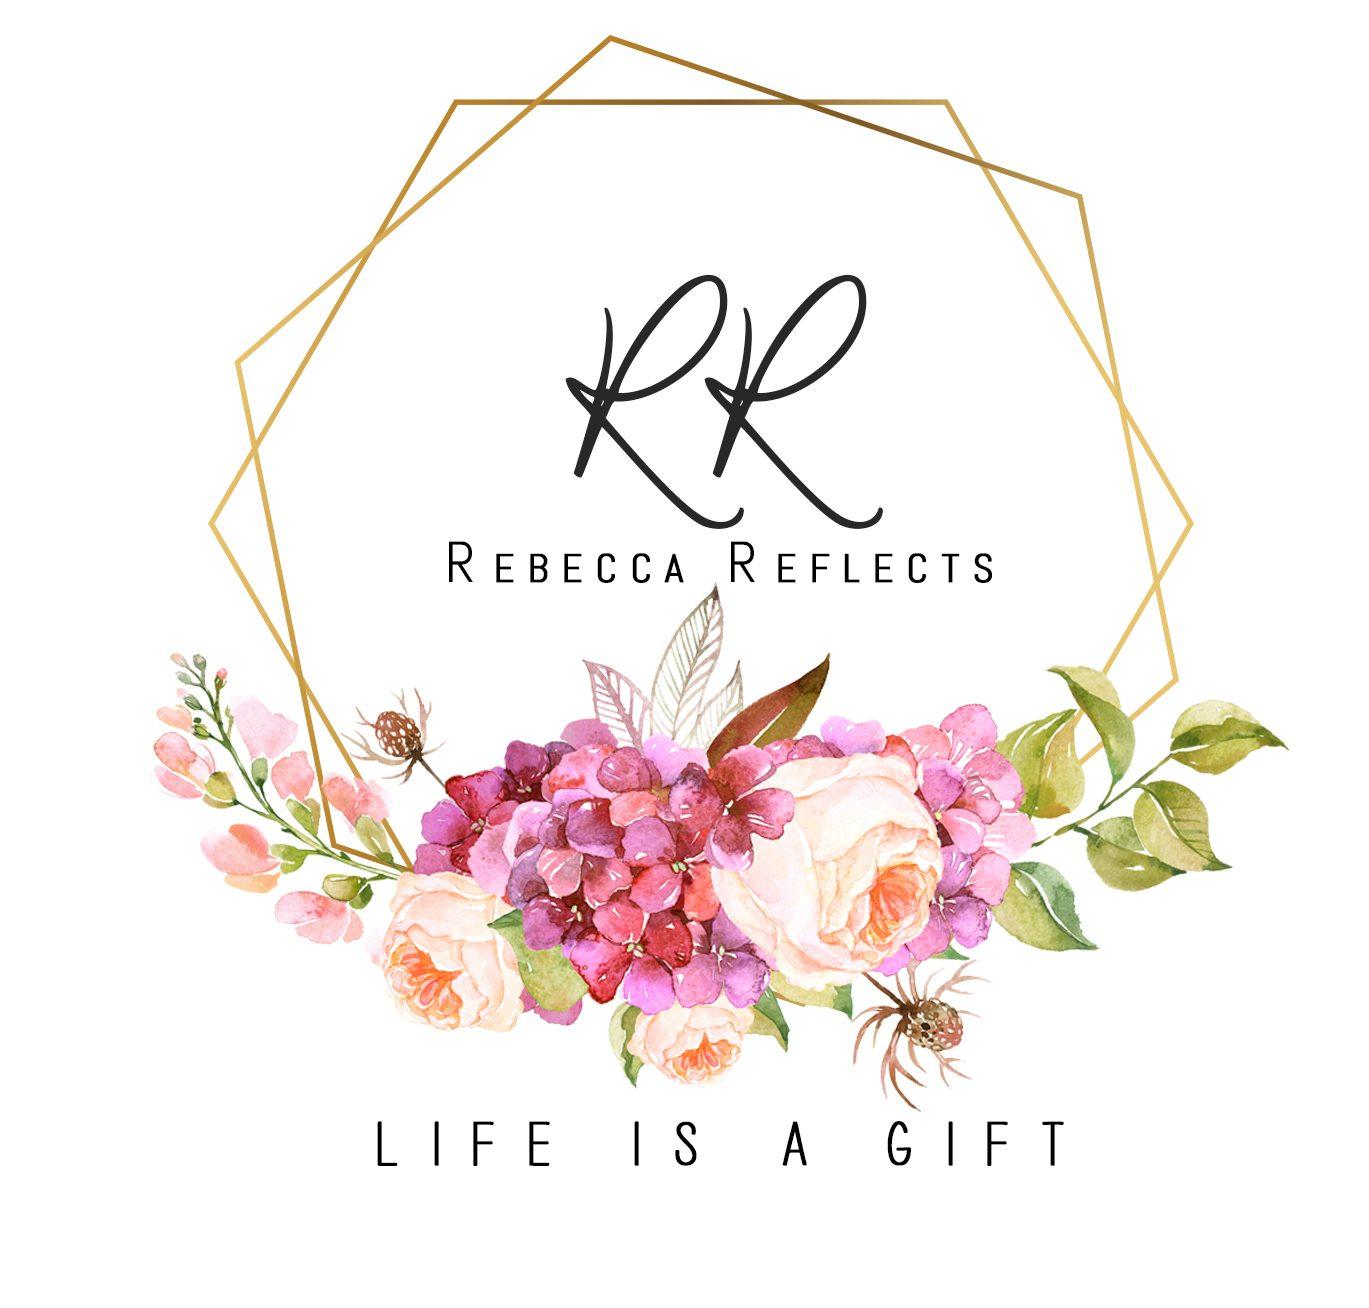 Rebecca Reflects